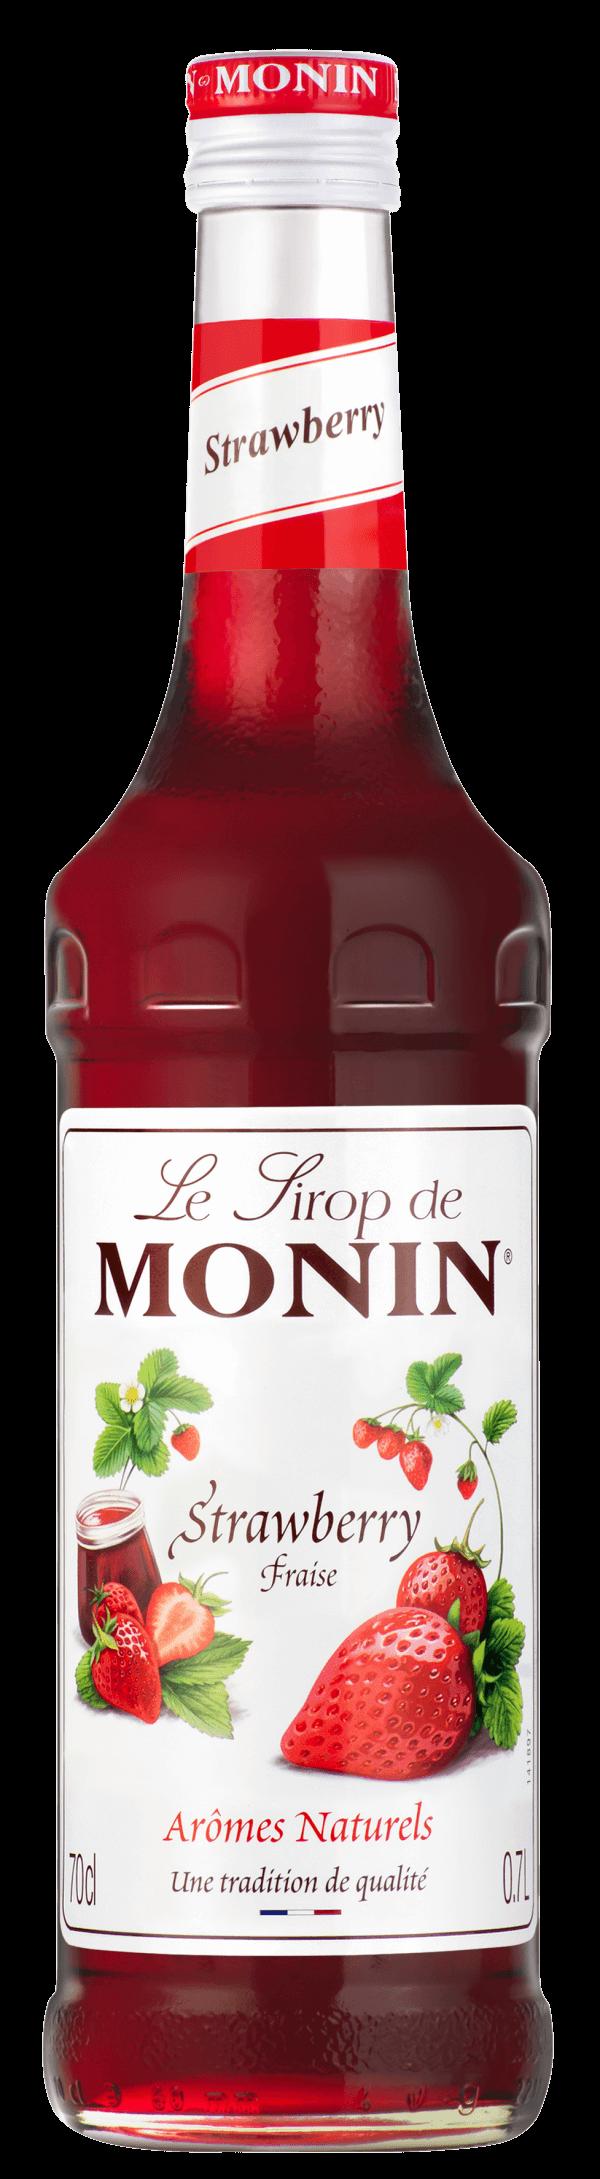 Monin_strawberry